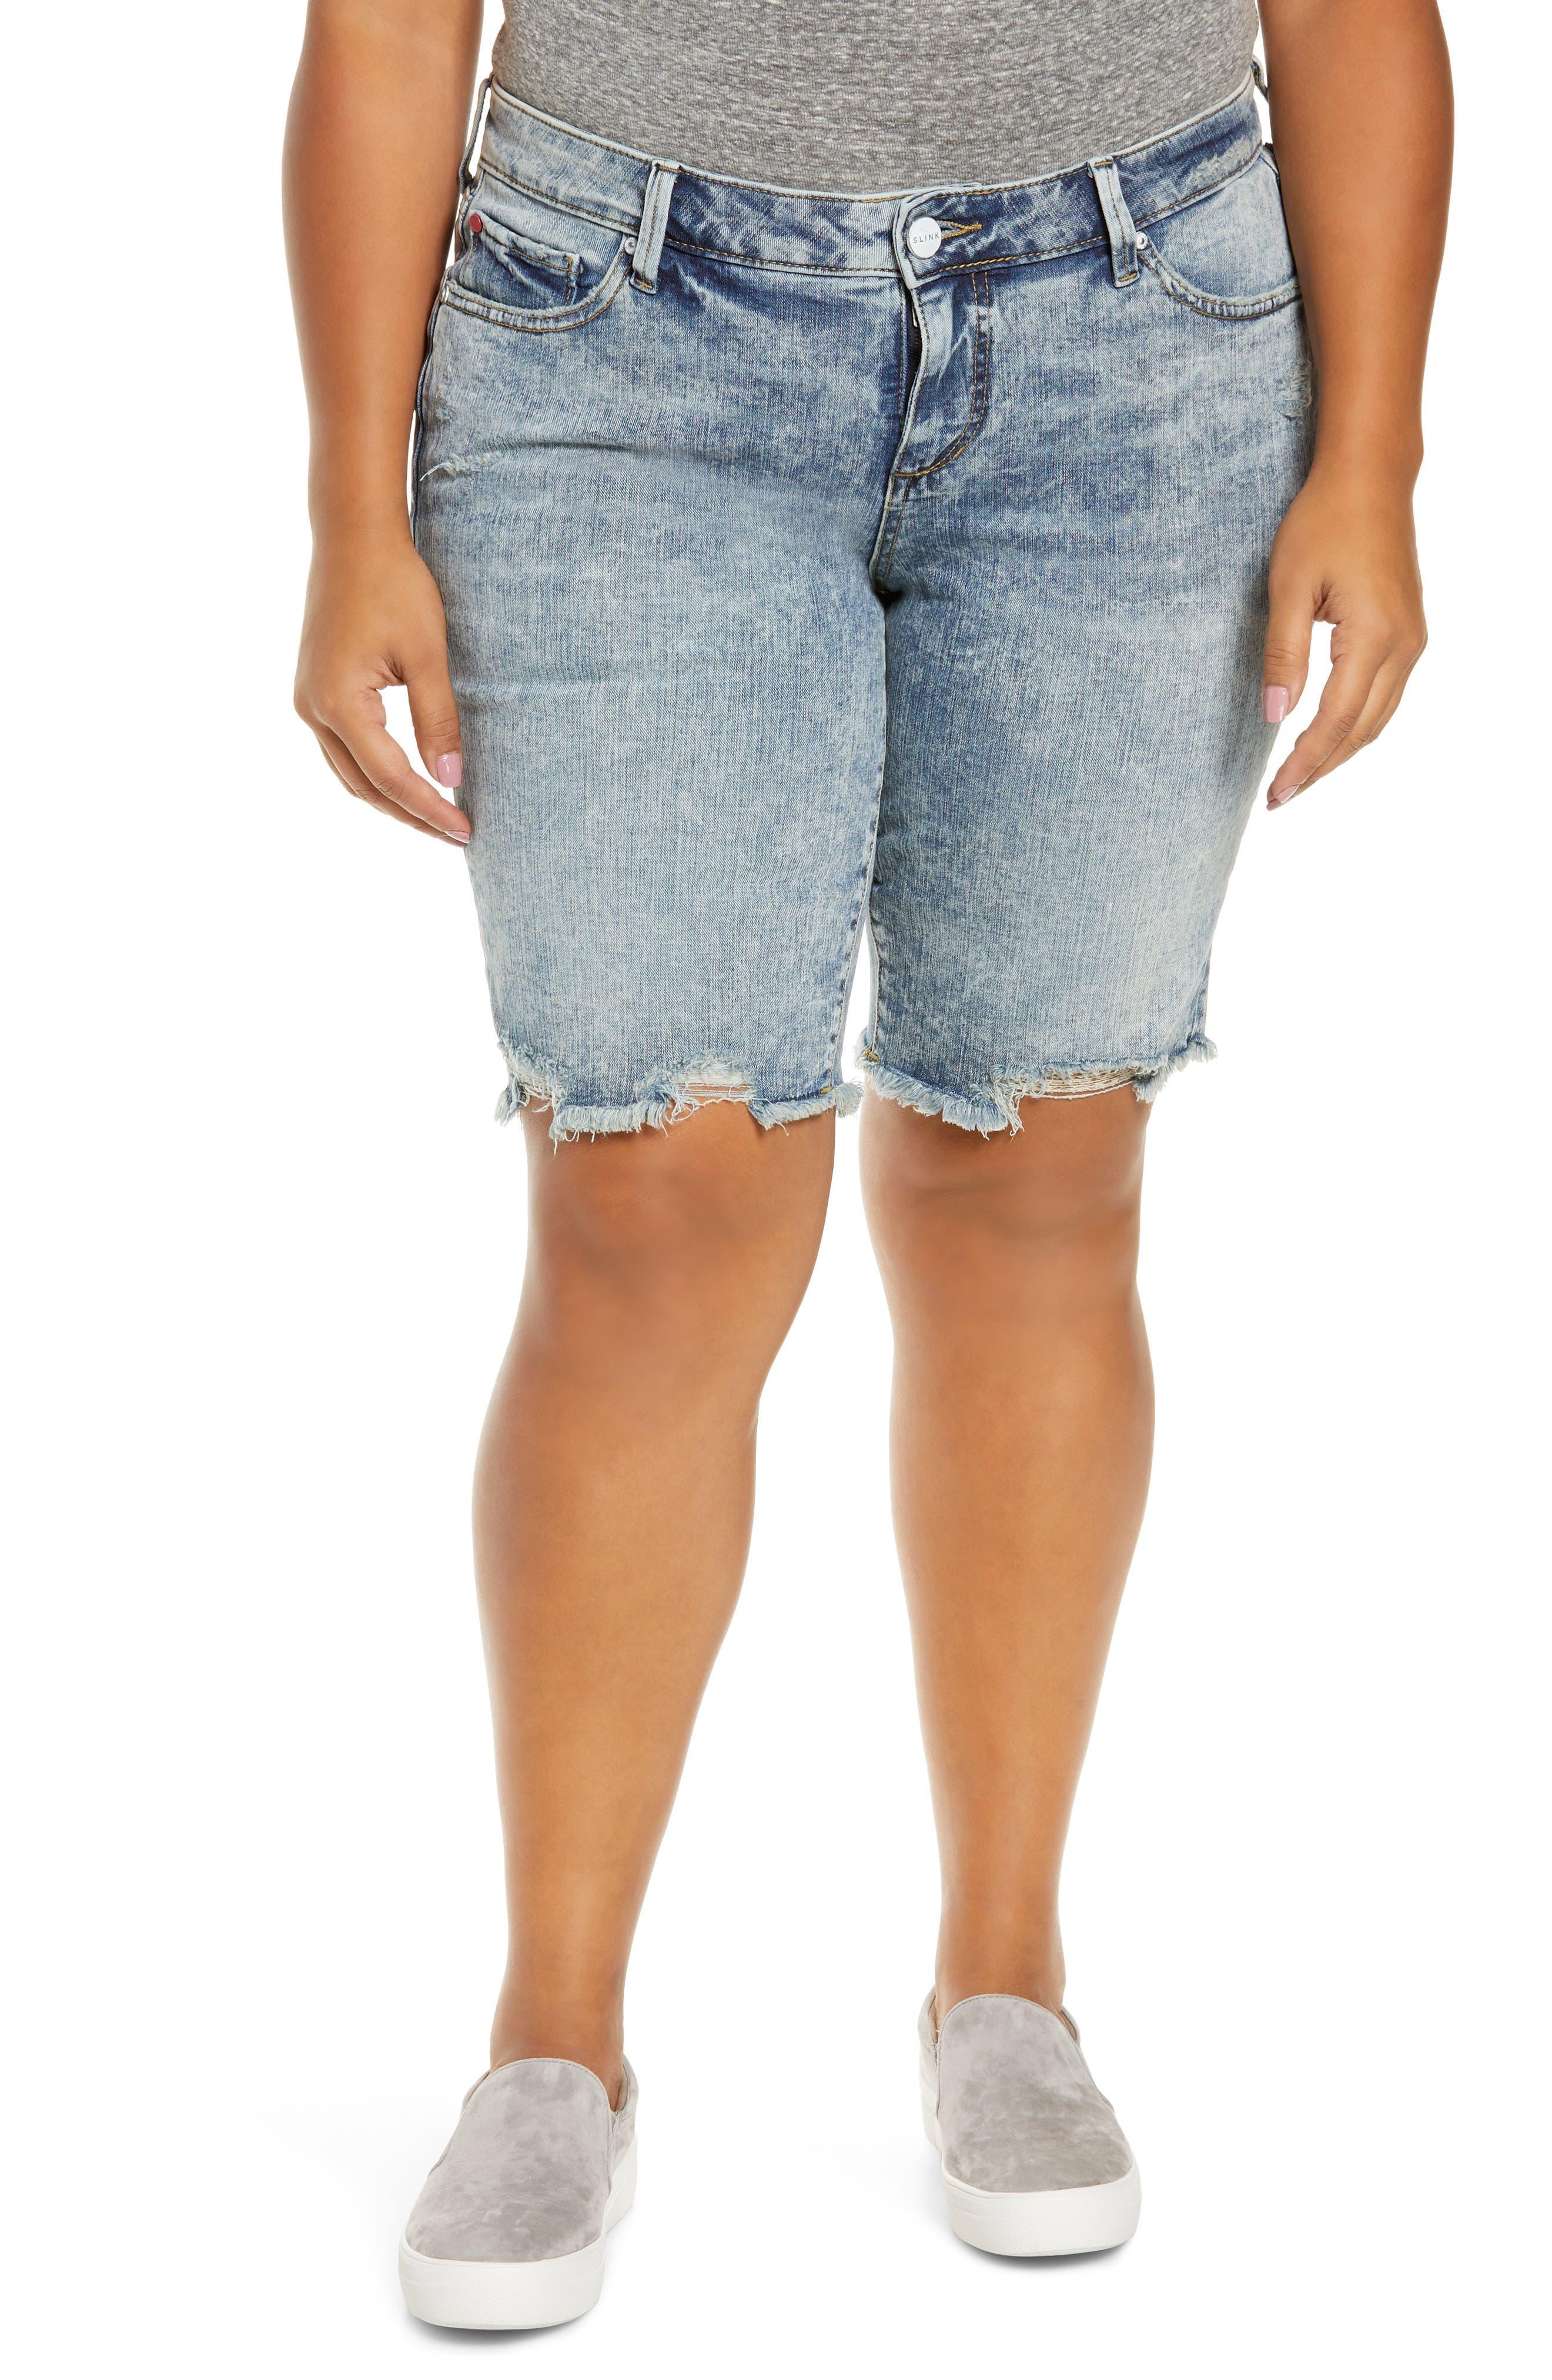 Plus Women's Slink Jeans Cutoff Bermuda Shorts